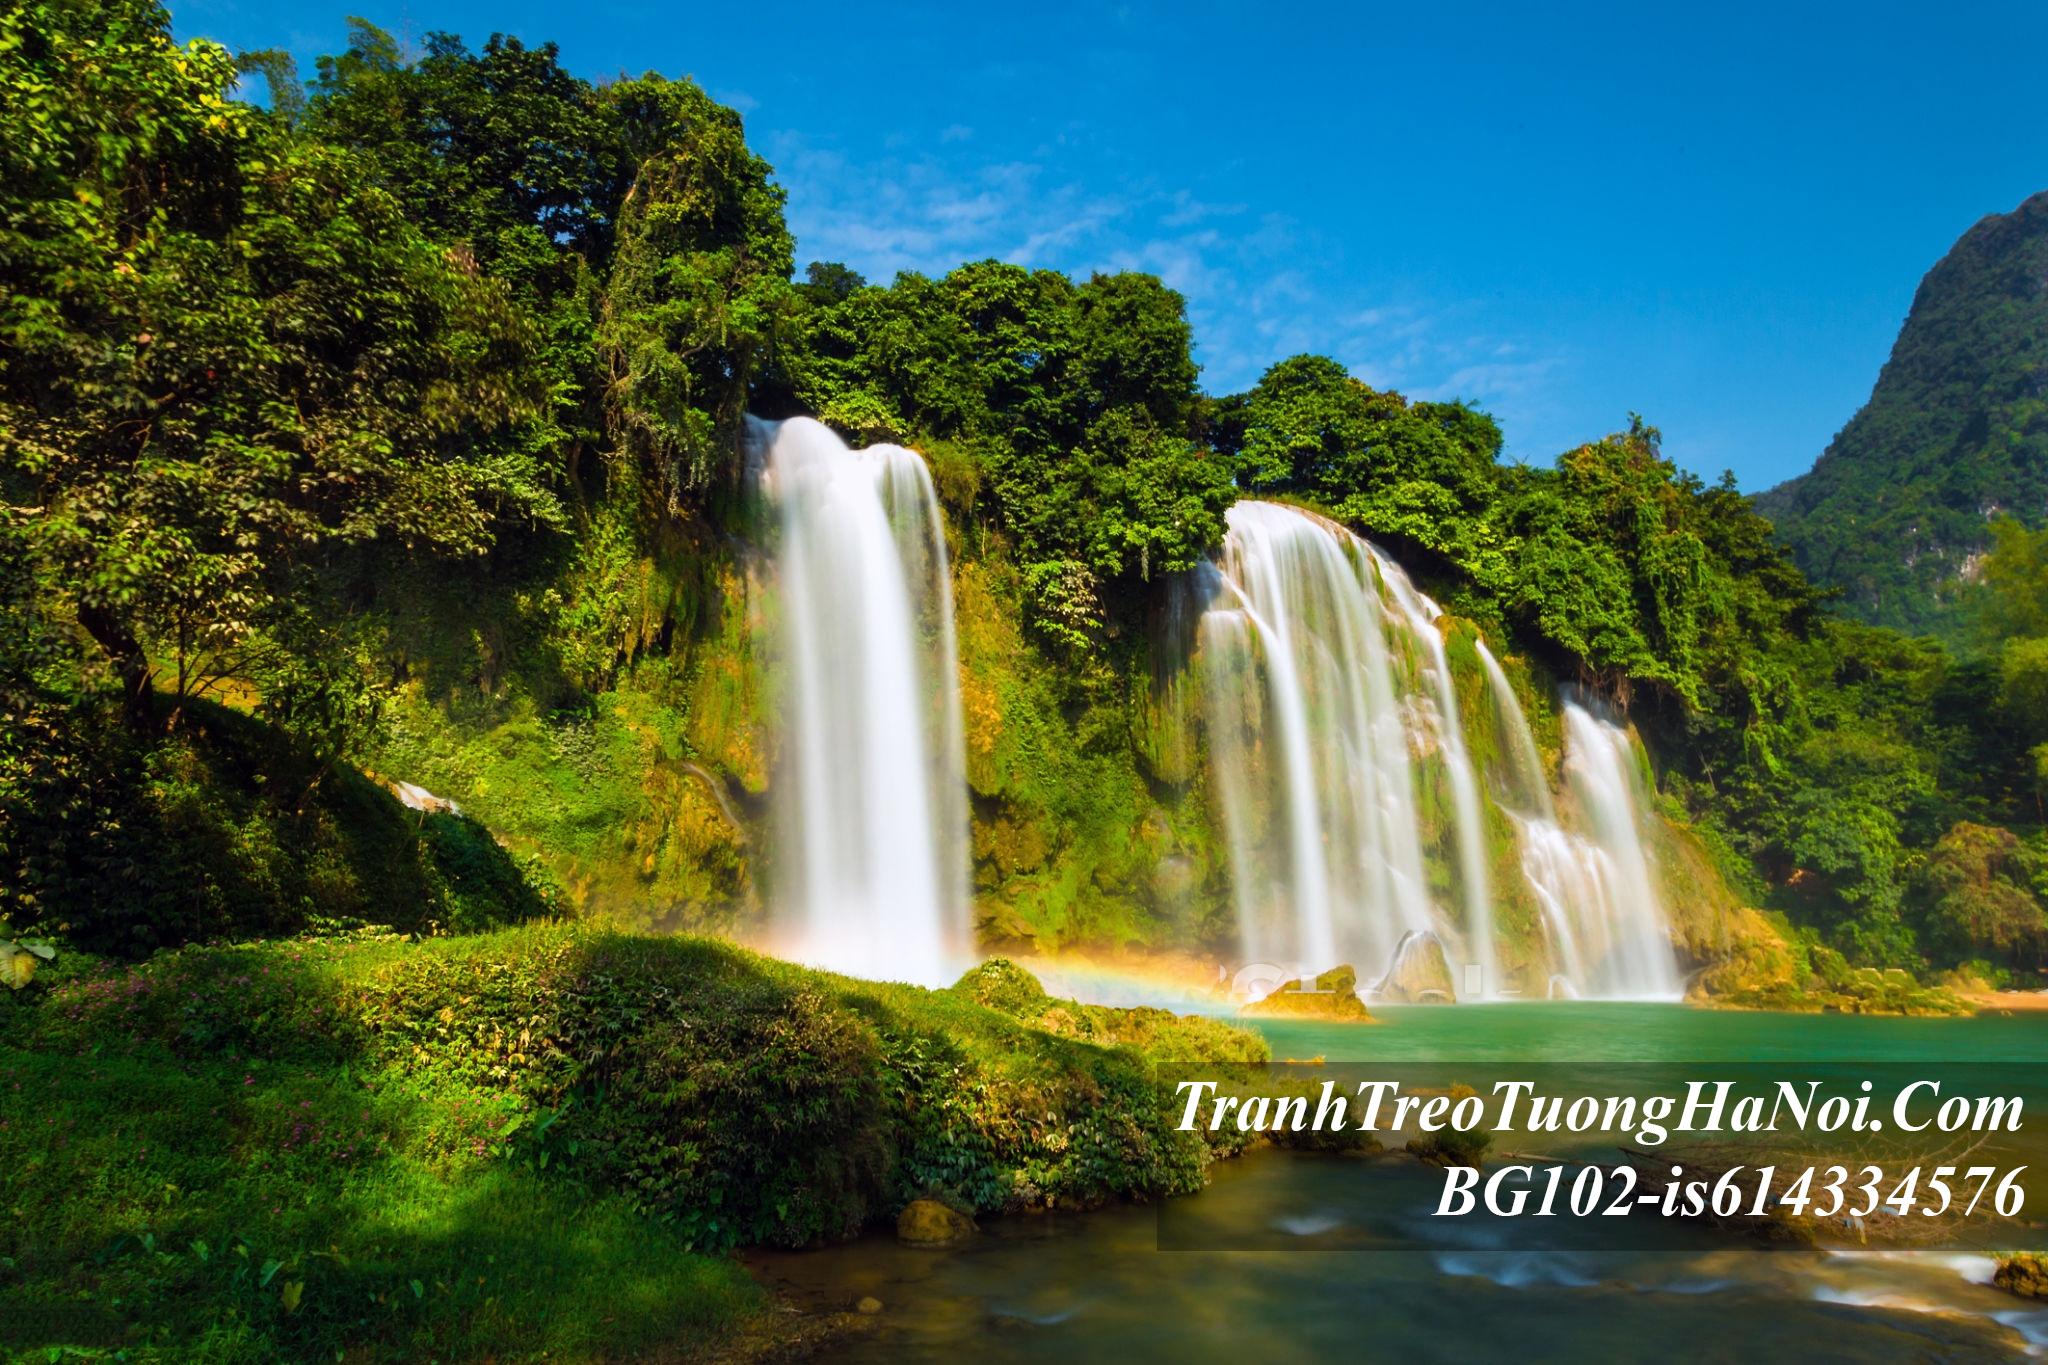 Phong canh thac nuoc ban gioc dep amia BG102-is614334576